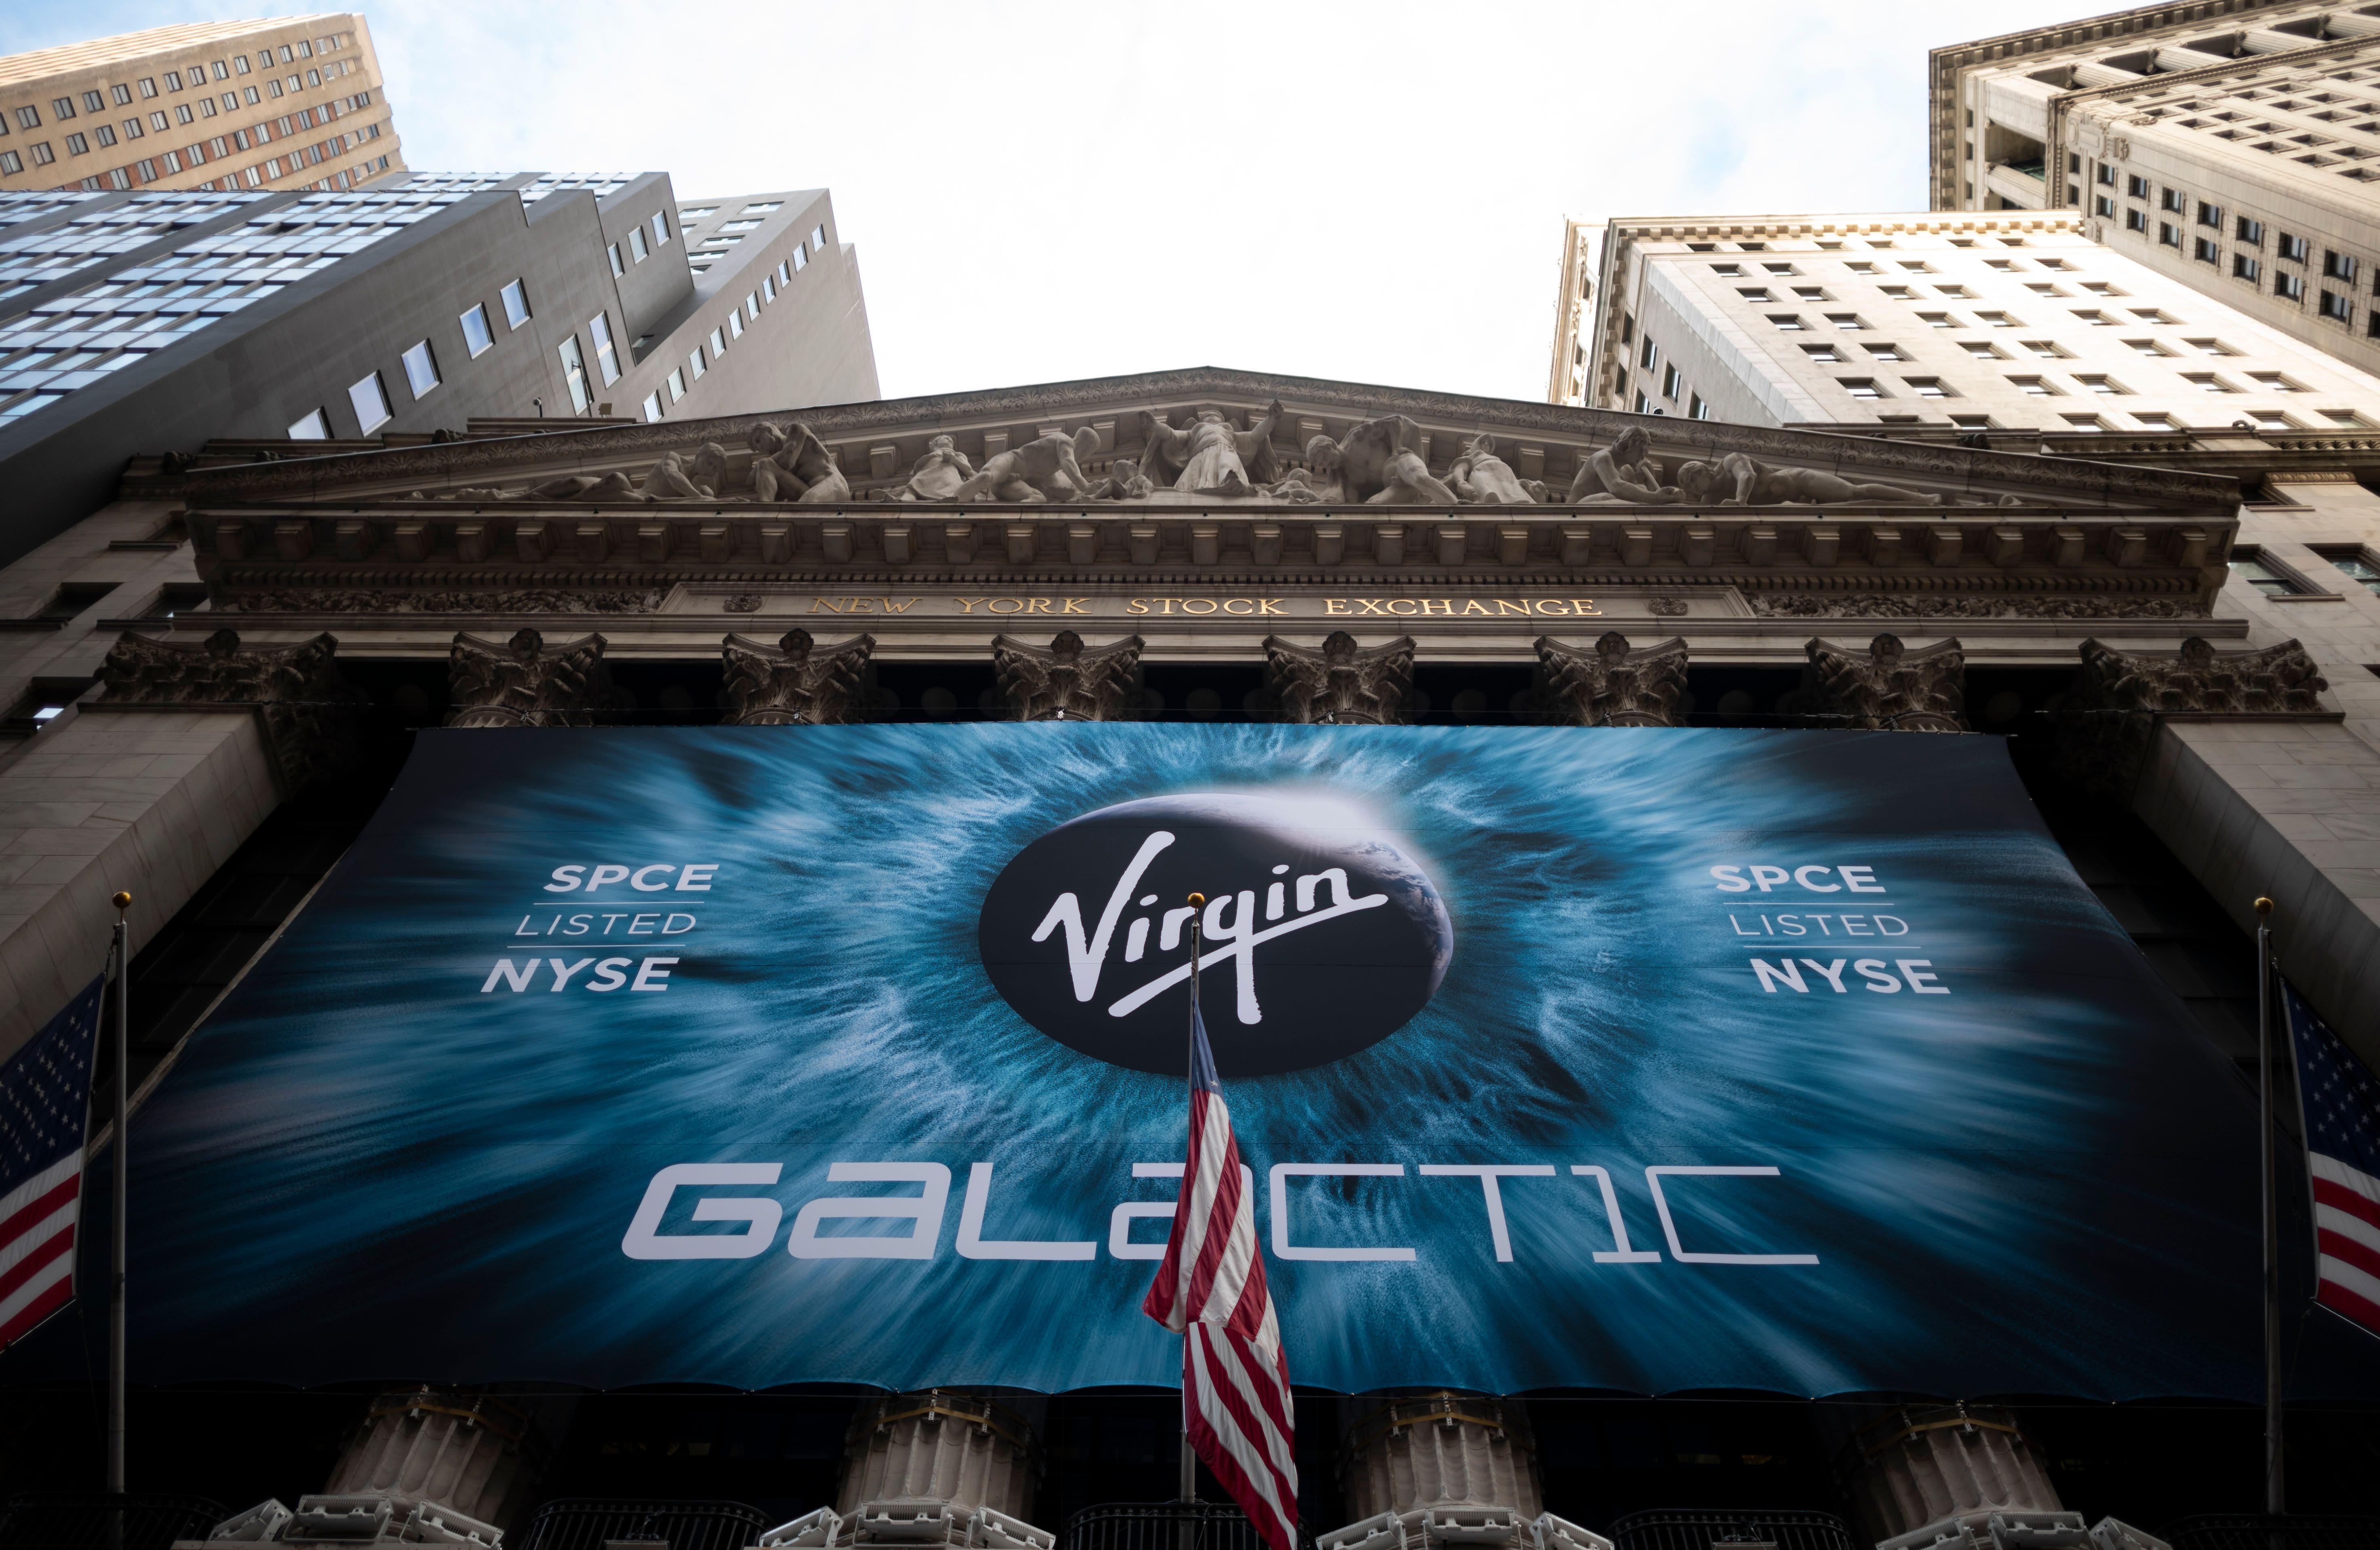 Nike, Virgin Galactic, Wells Fargo and more